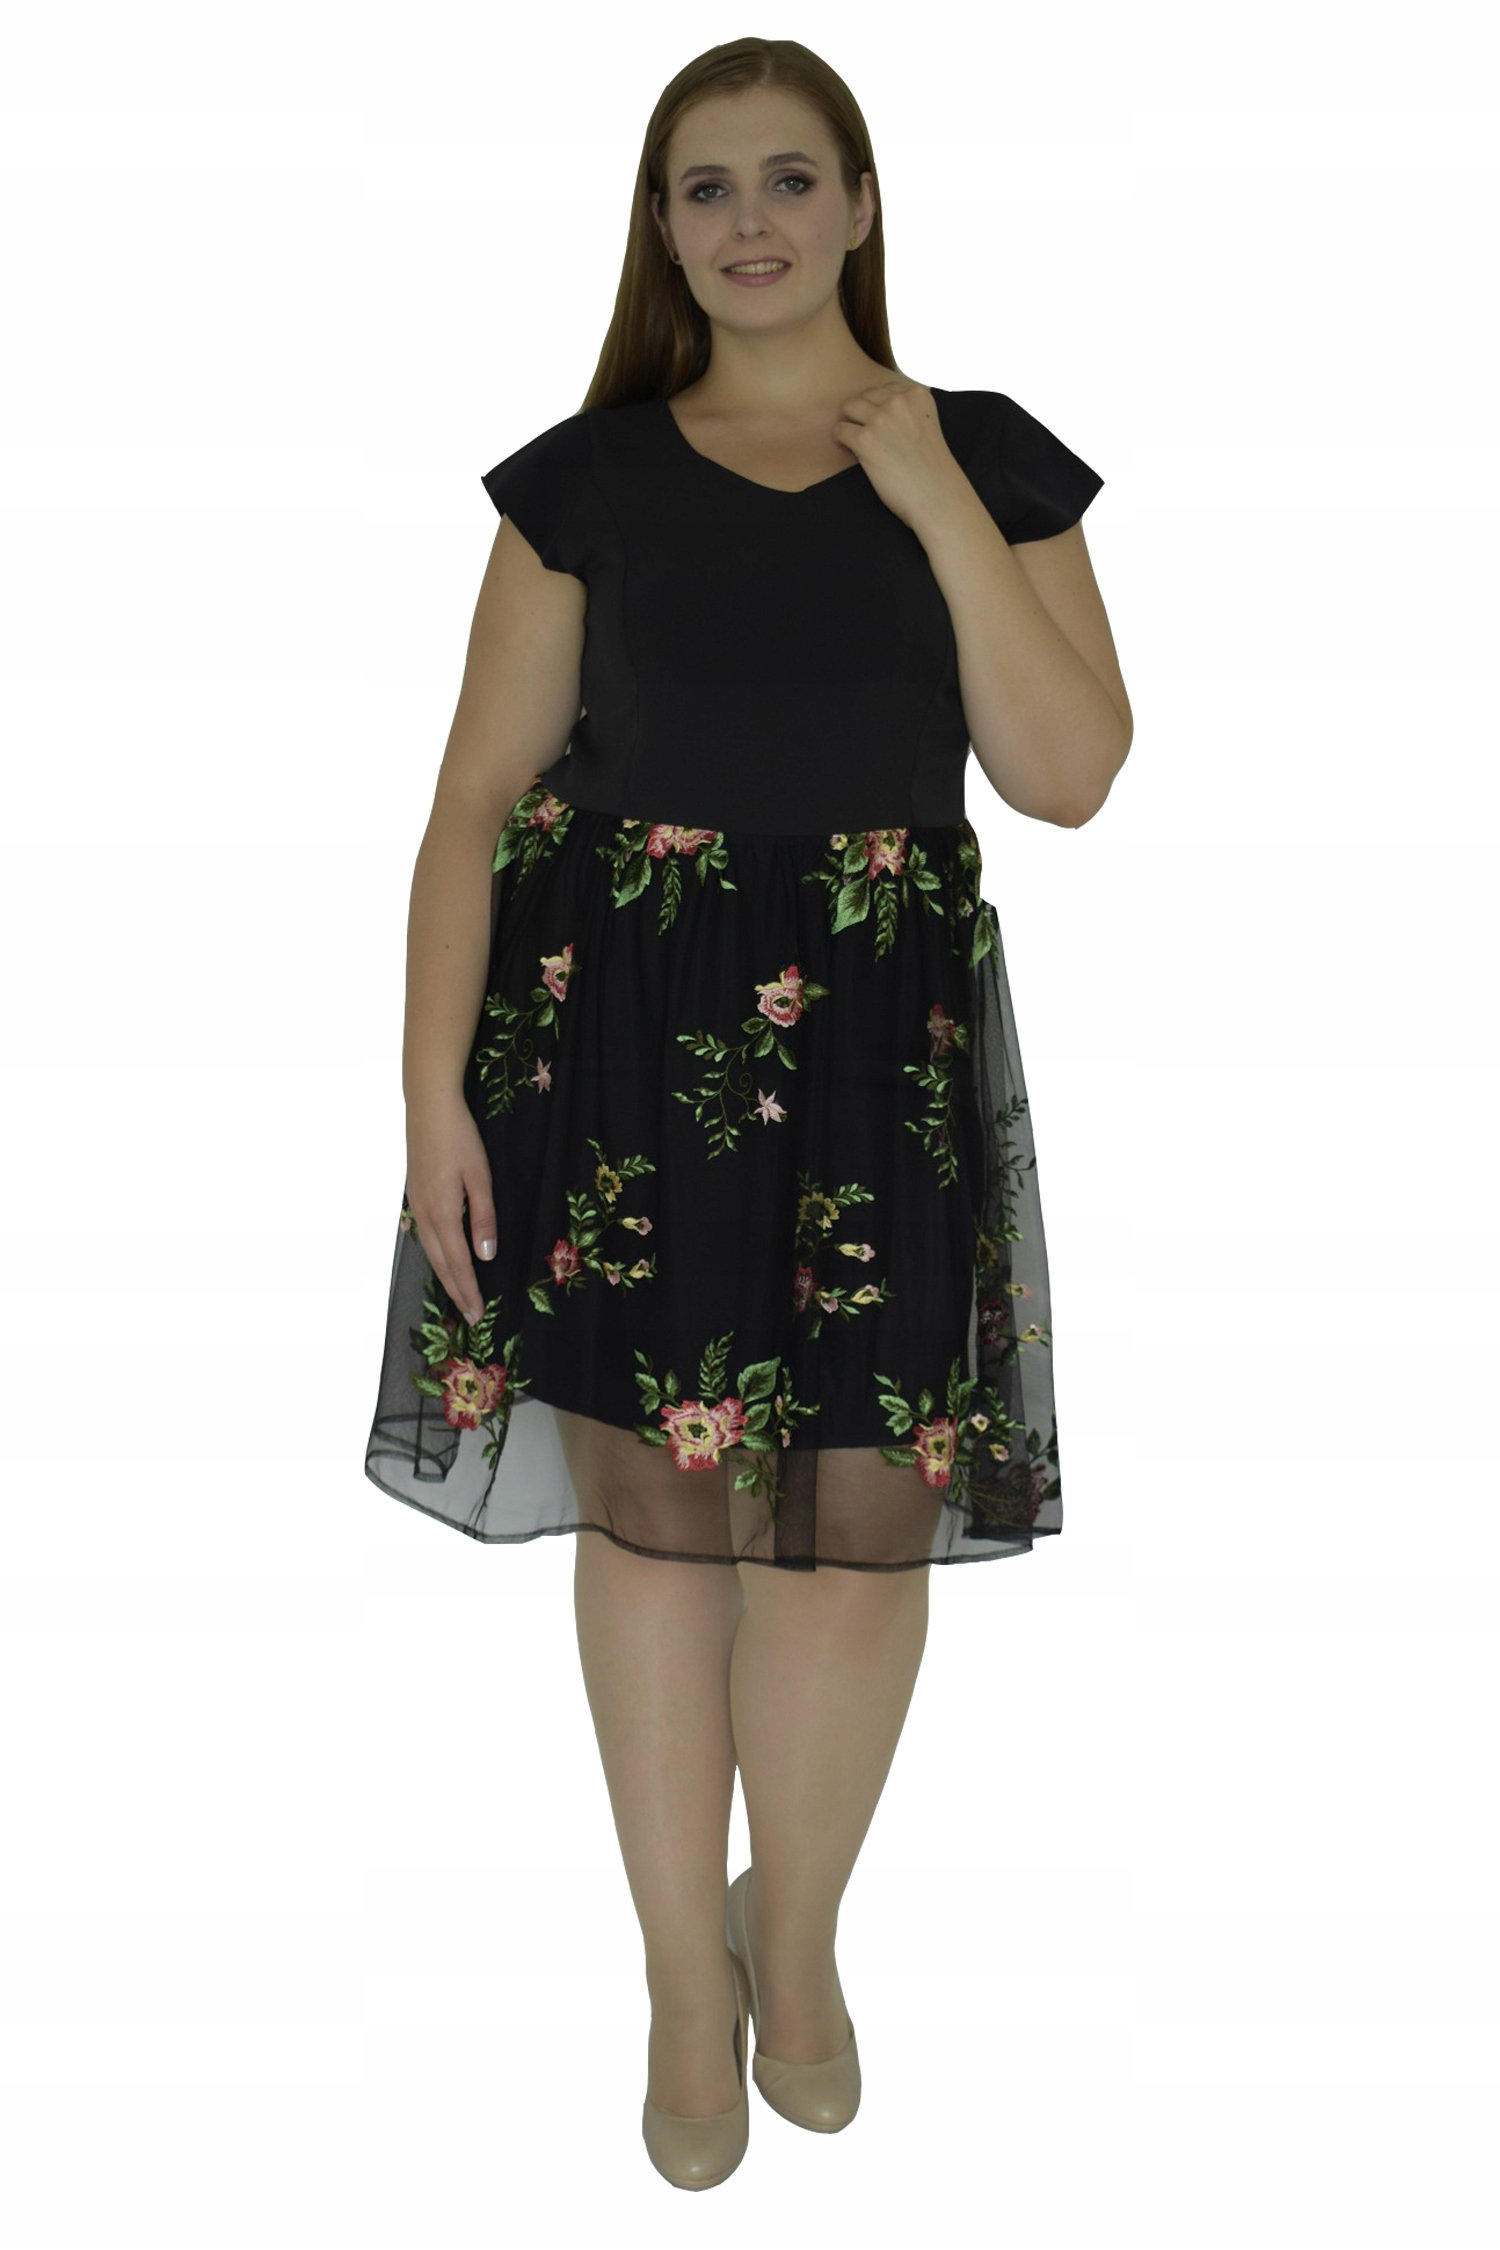 b6e9fde860 Sukienka AGATA szyfon haft czarna w gałązki 46 - 7537264320 ...